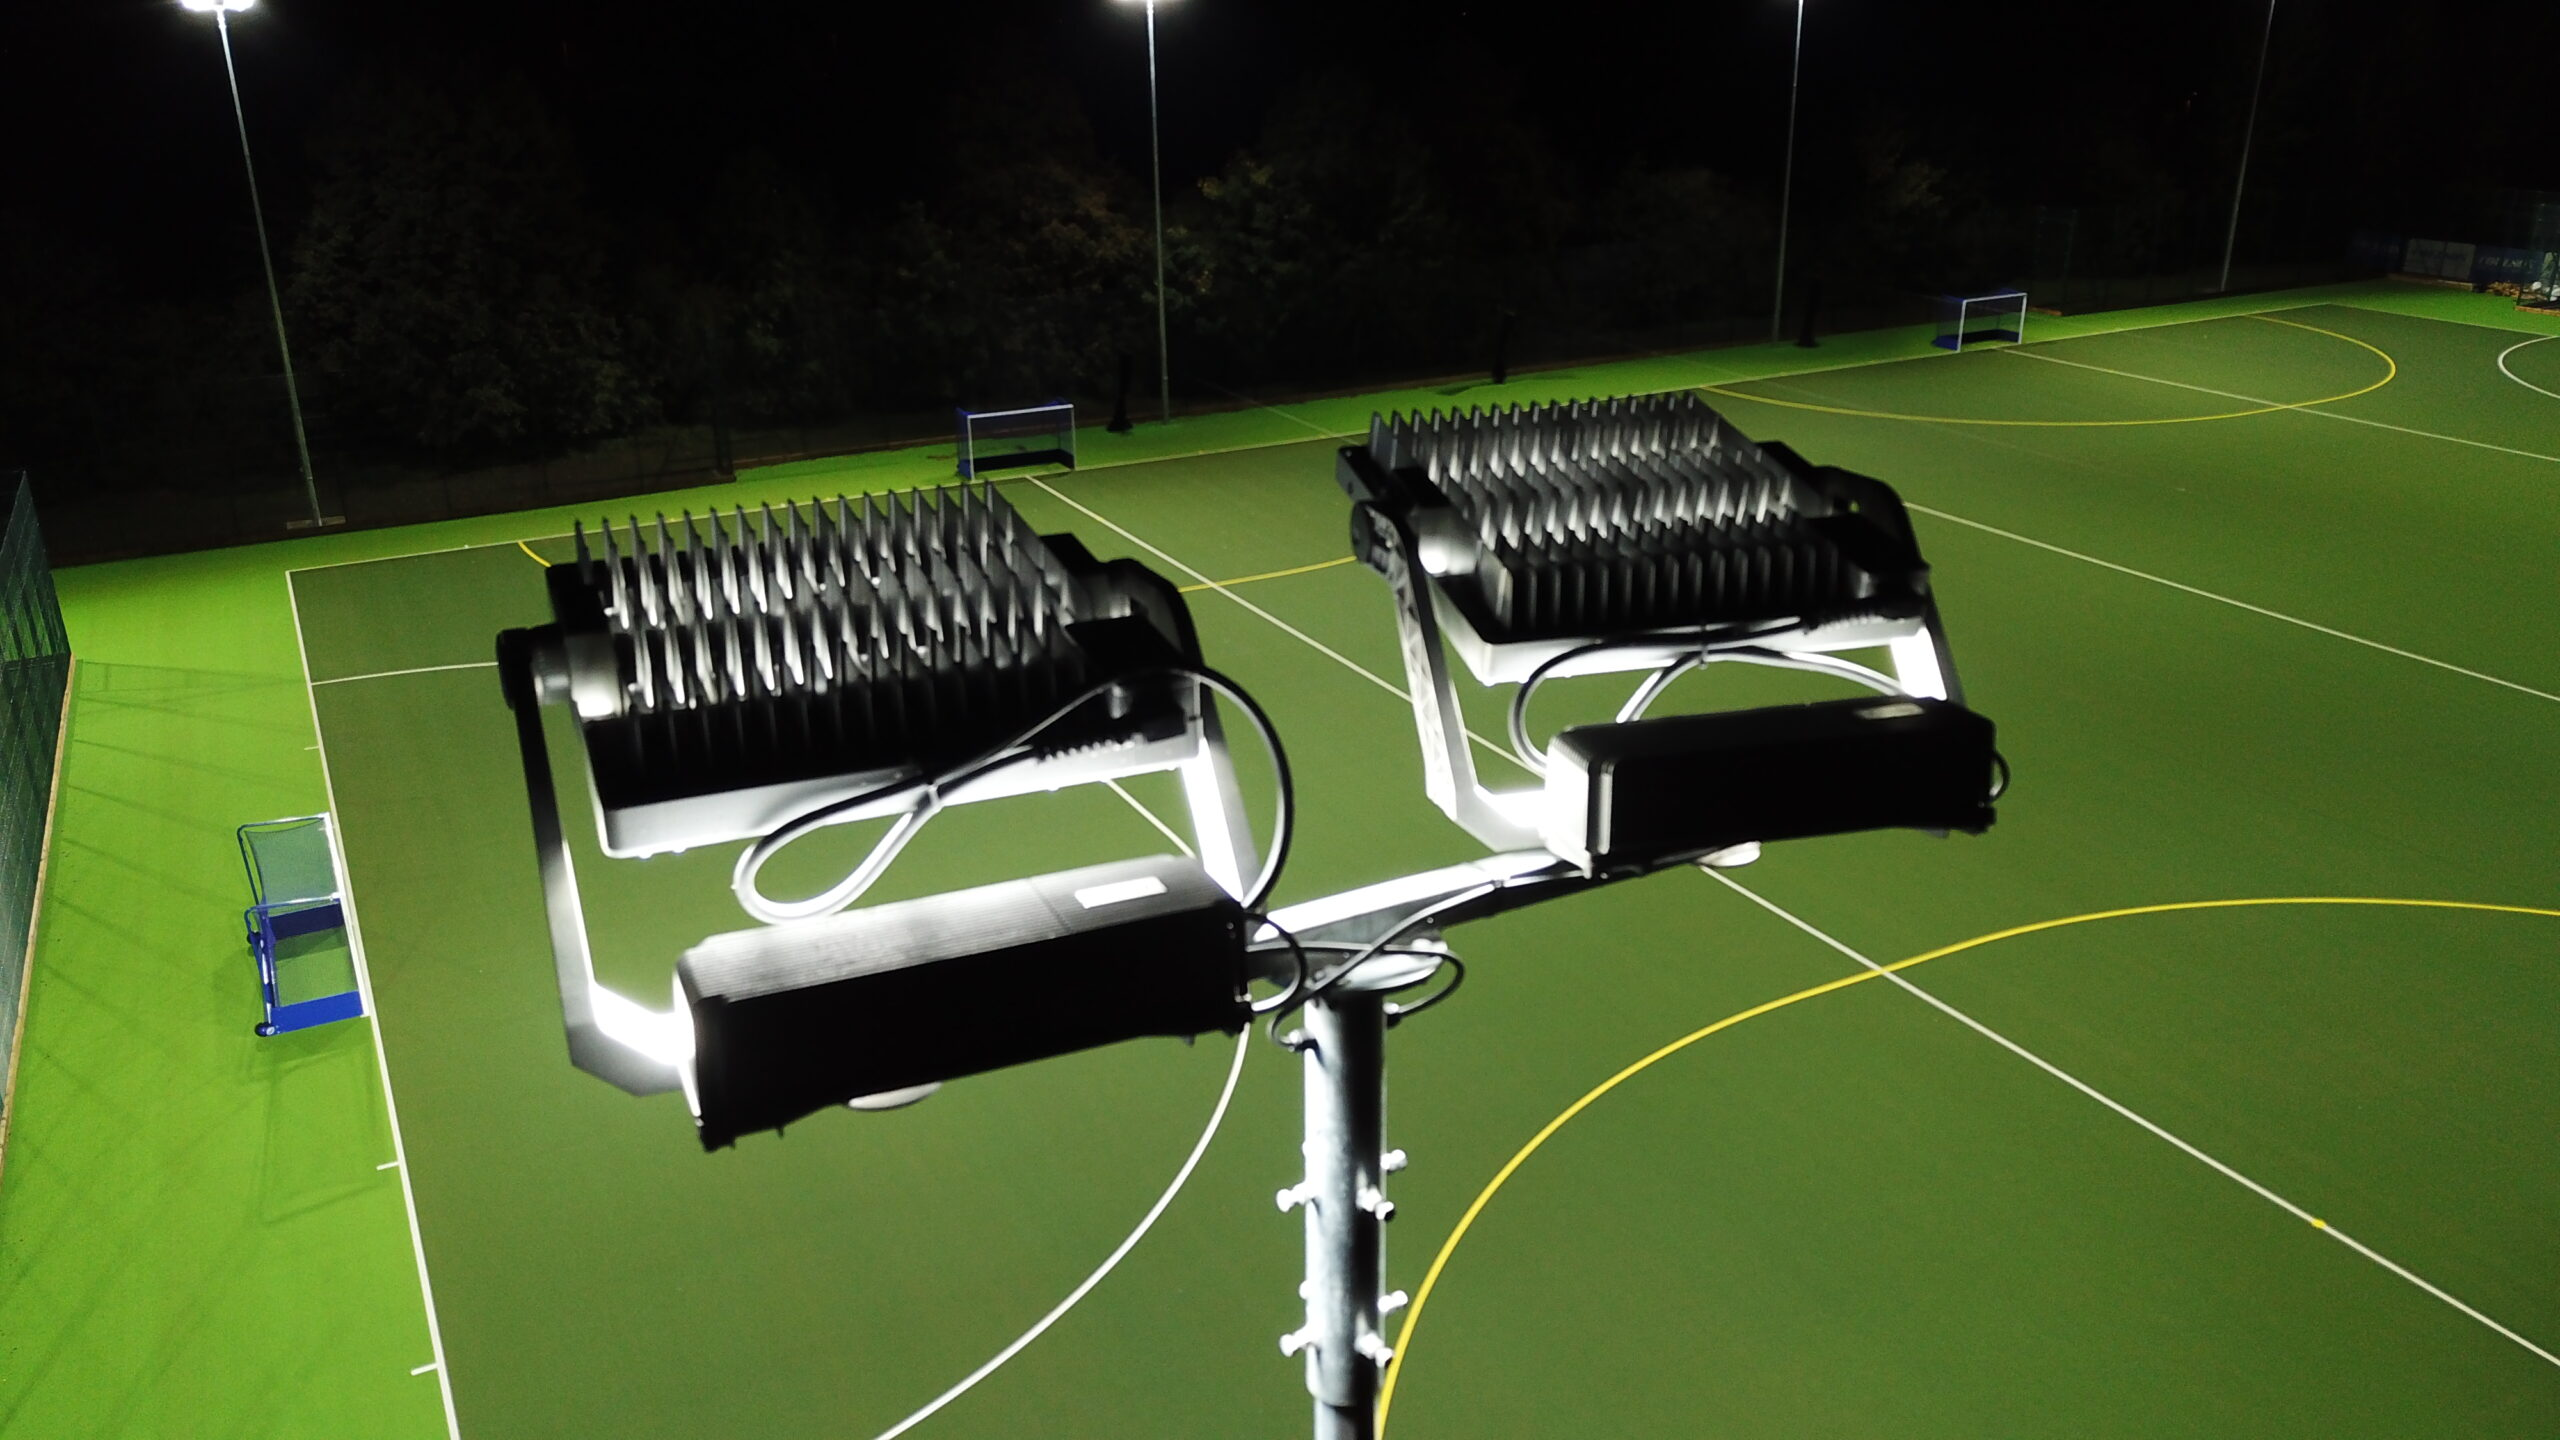 st marys school led floodlights installed by halliday lighting